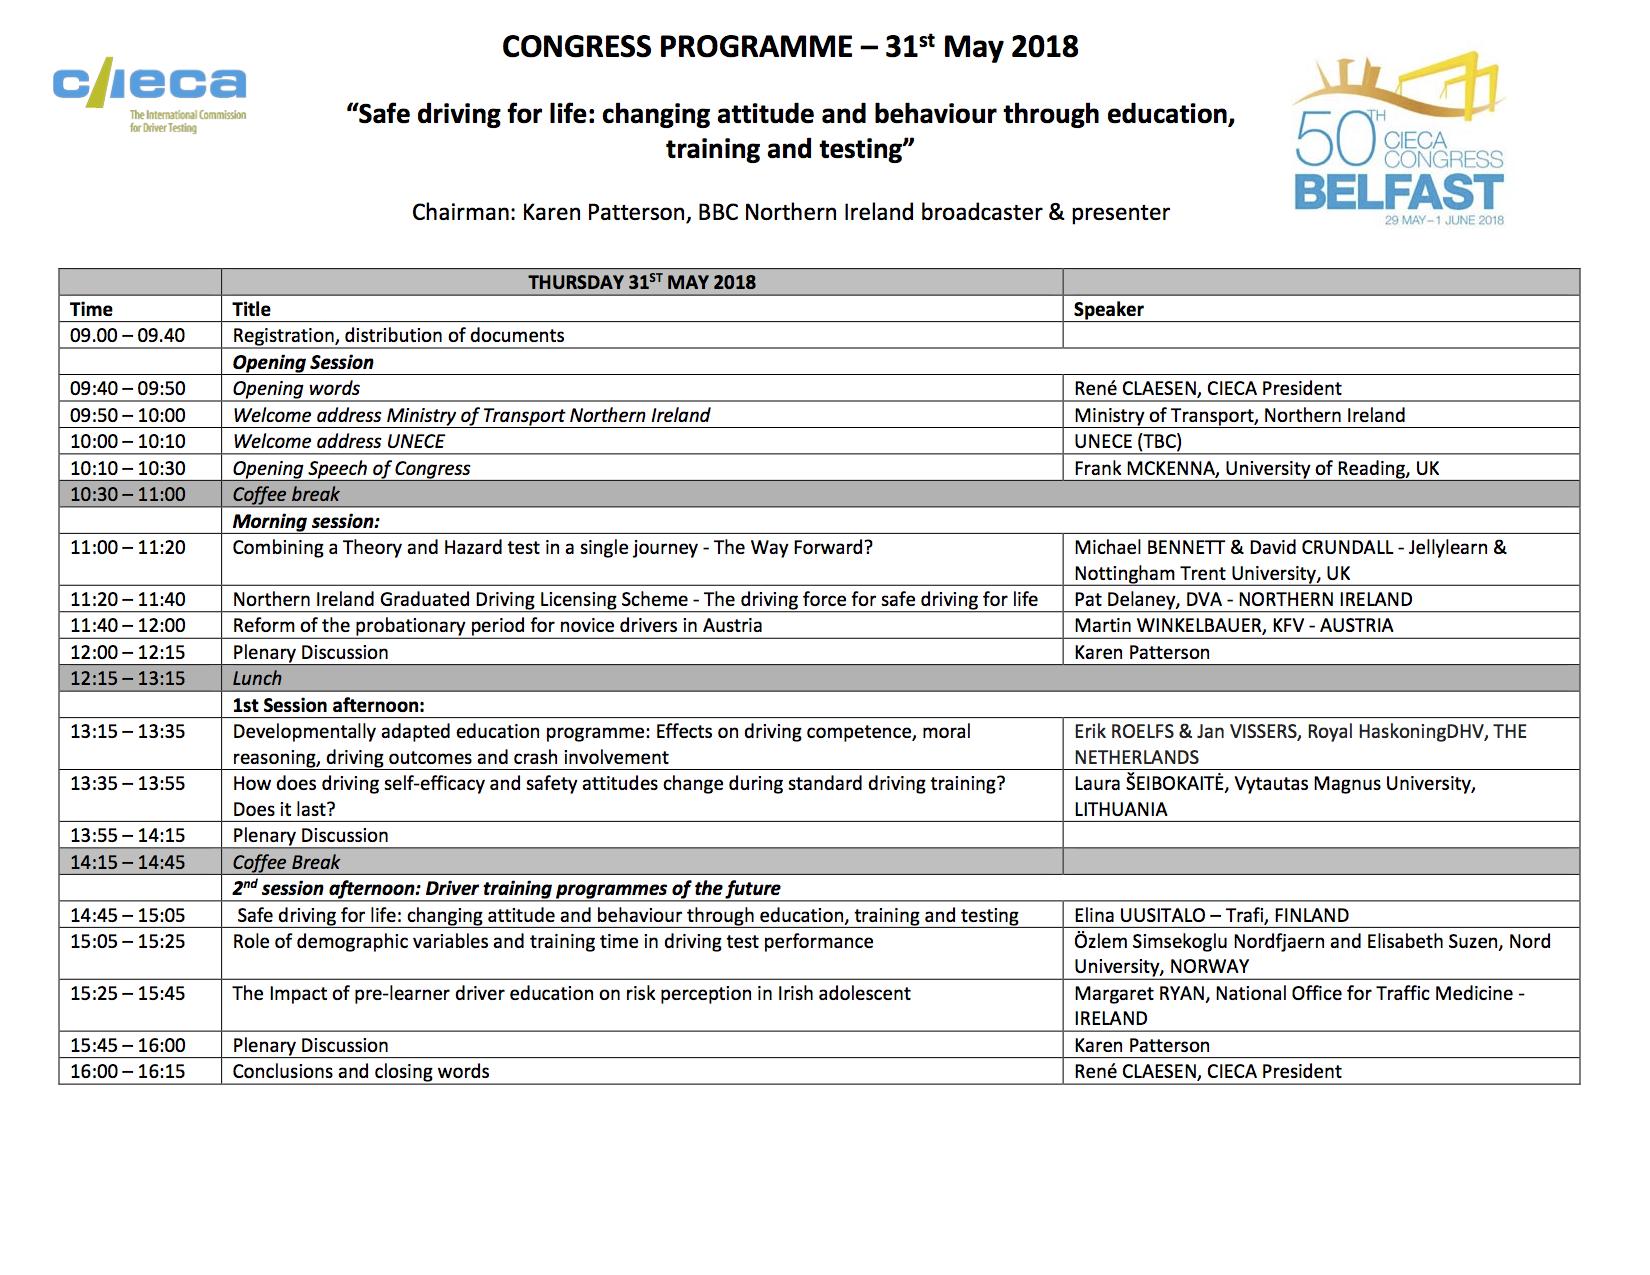 Congress programme draft 5.png